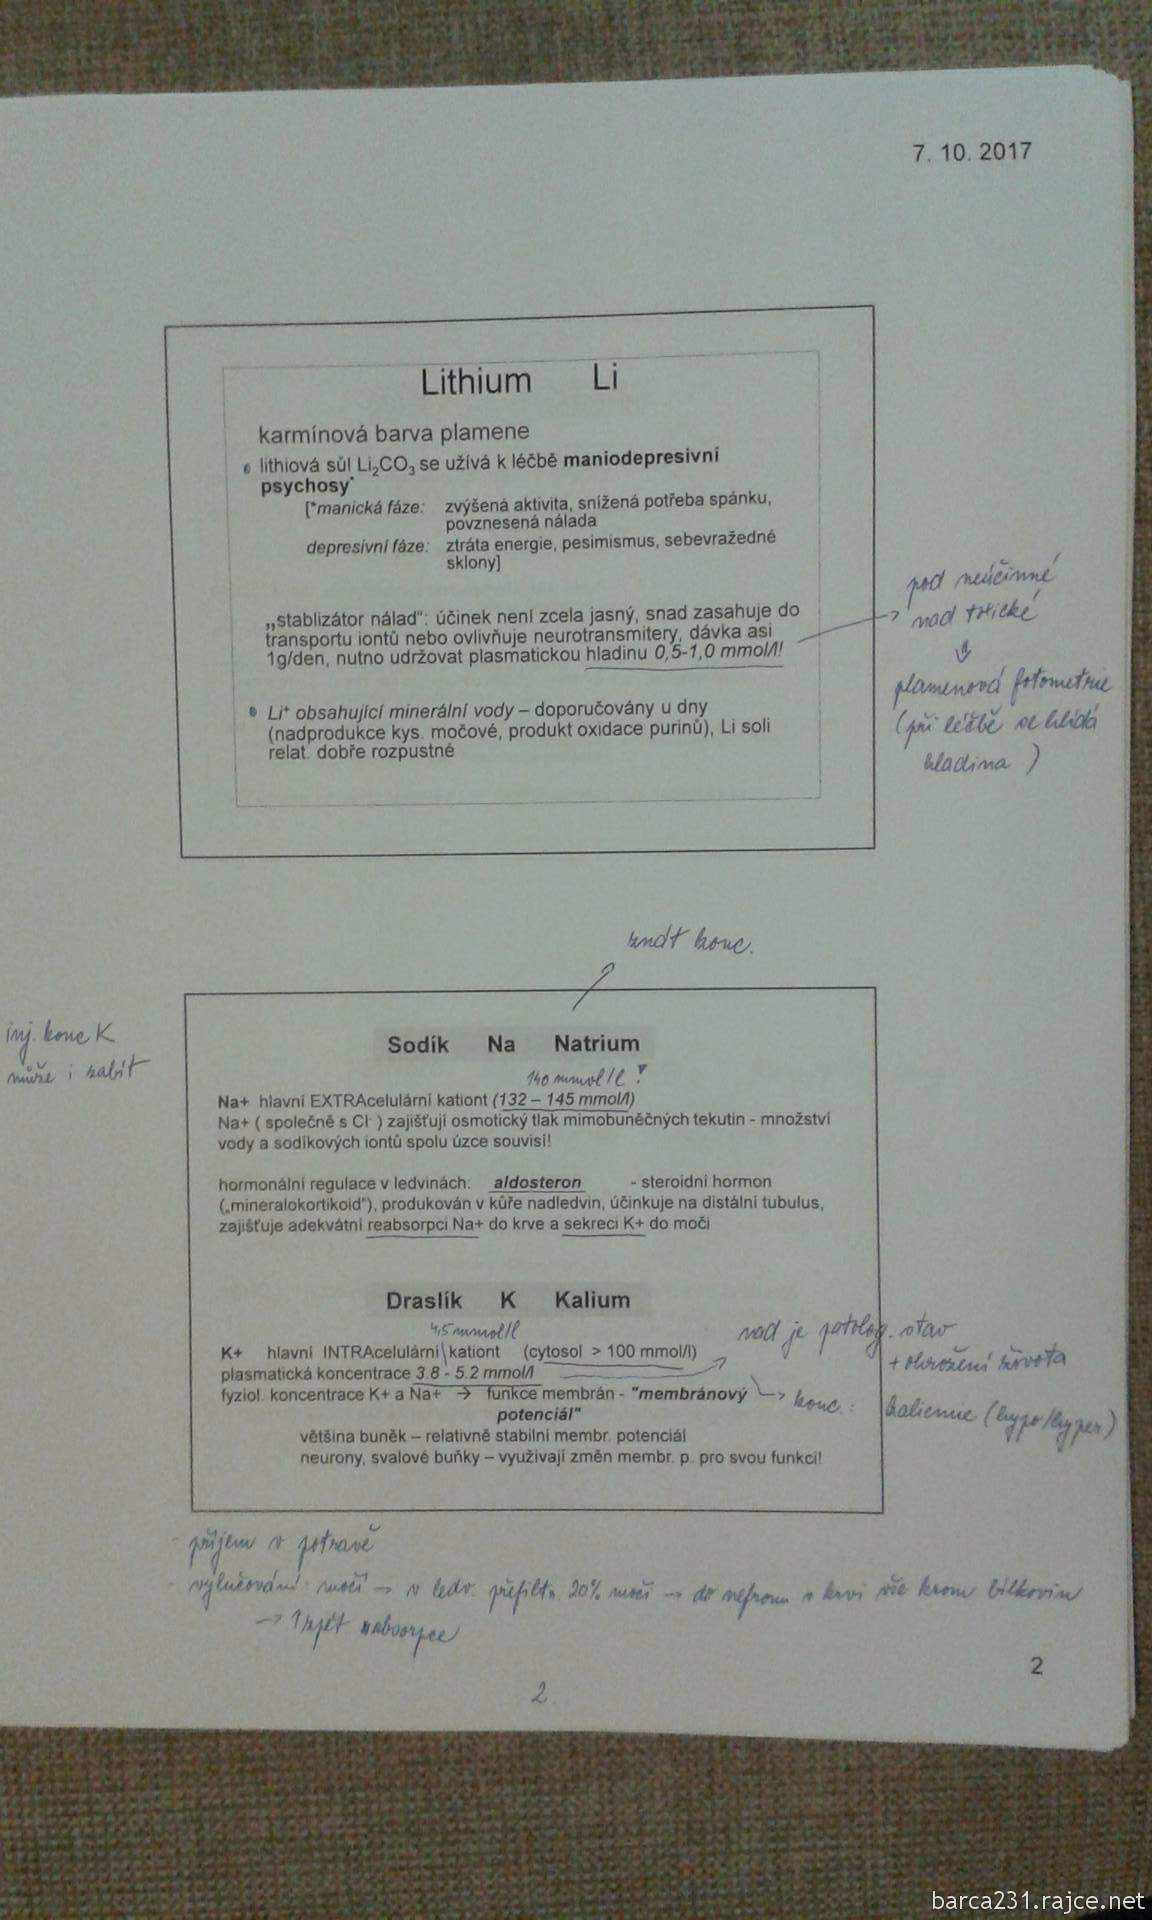 Chemie Prednasky Iii Barca231 Album Na Rajceti